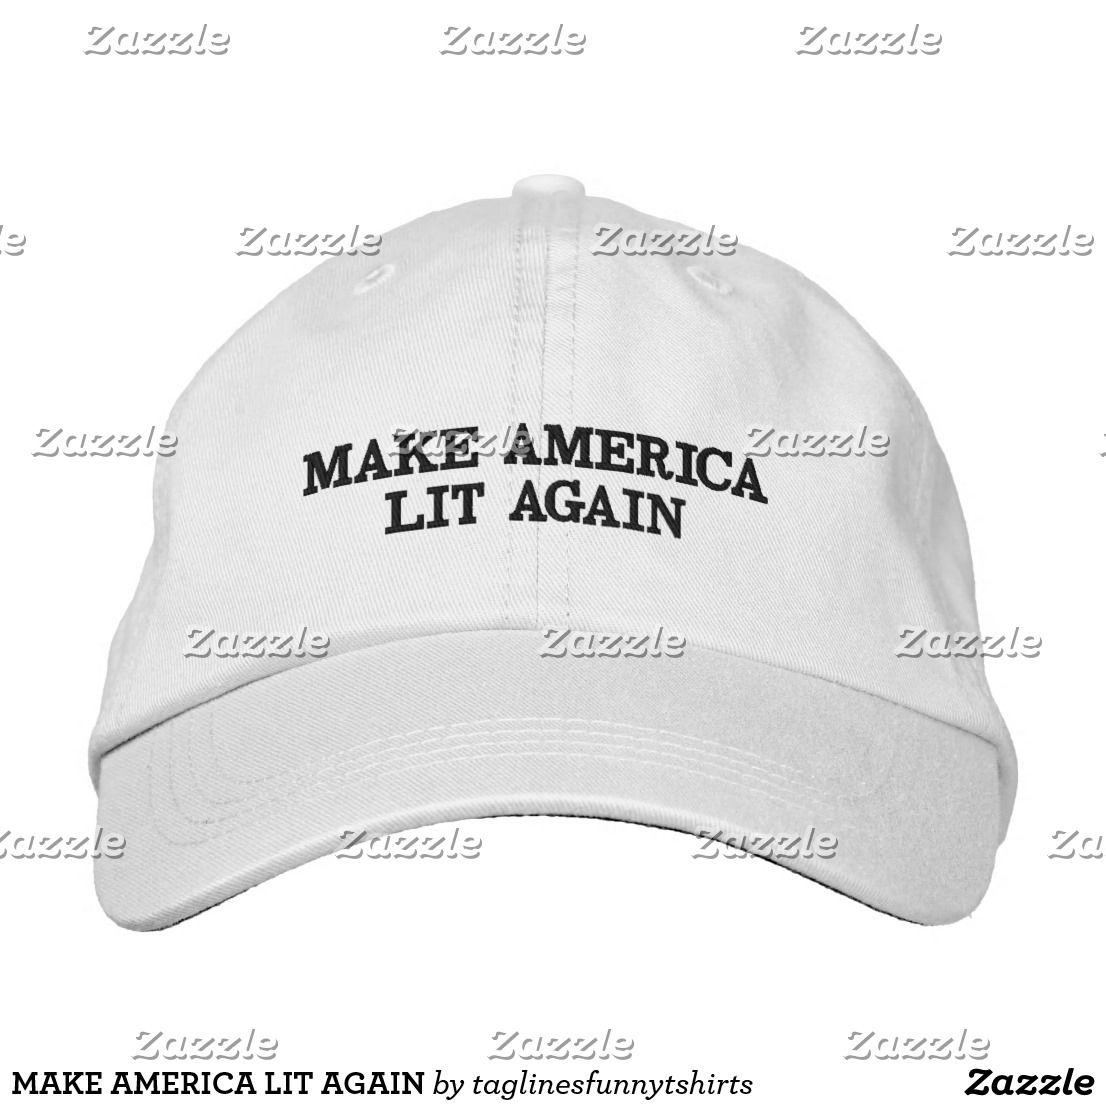 b7197eedfd8 MAKE AMERICA LIT AGAIN EMBROIDERED BASEBALL CAP. AMERICAN FLAG. AMERICAN  PRIDE. 4TH OF JULY OUTFIT IDEA. GOD BLESS AMERICA